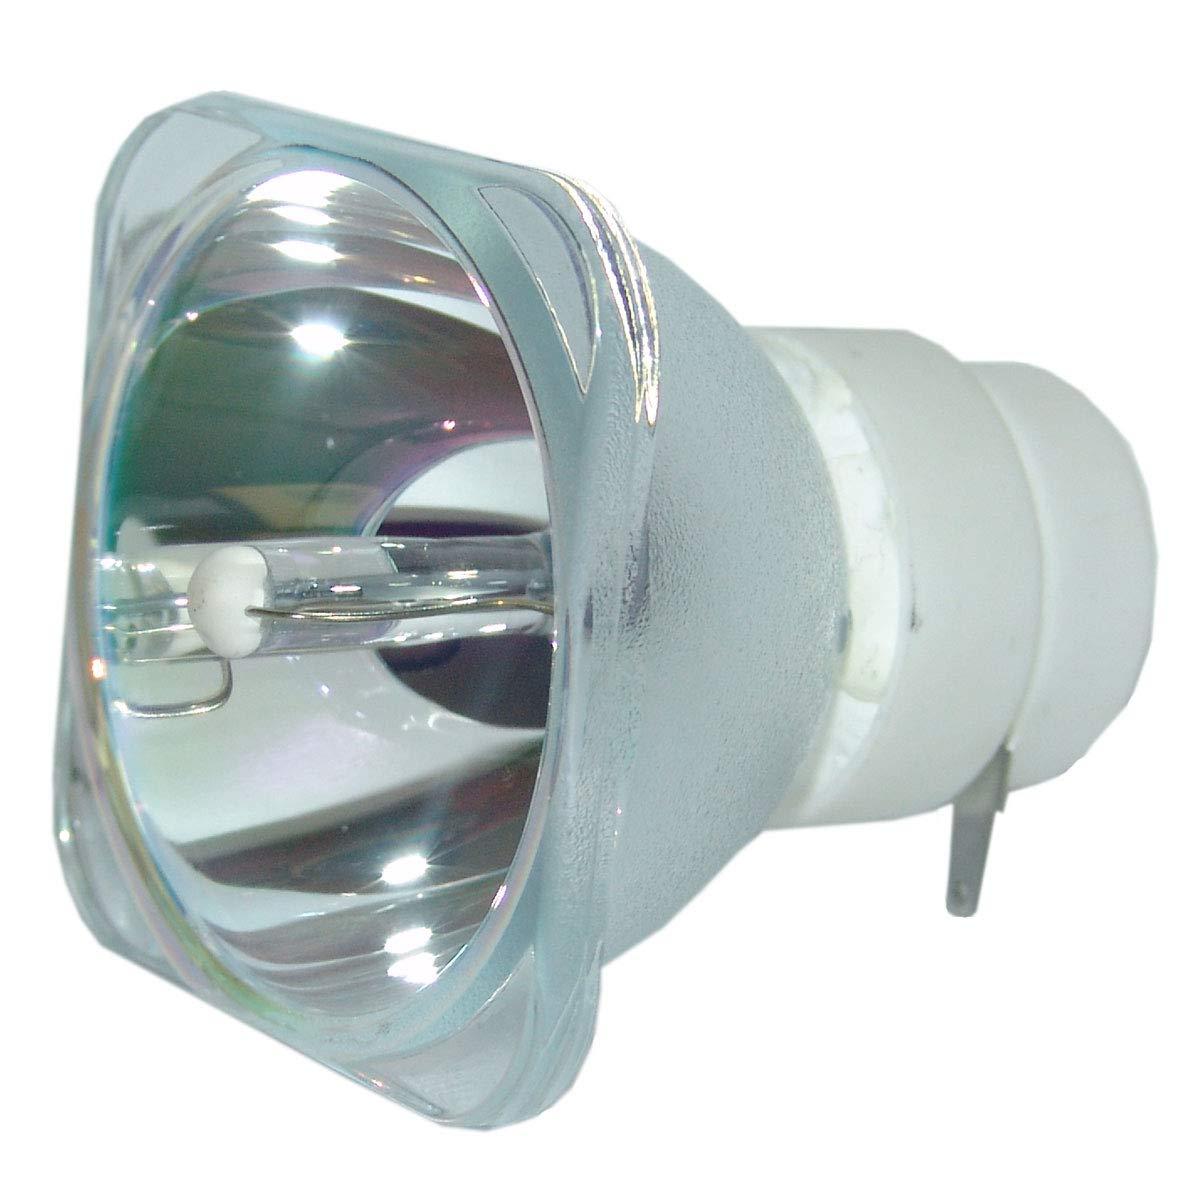 SpArc InFocus IN3916用交換用ランプ 囲い/電球付き Economy B07MPSVV2X Lamp Only Economy